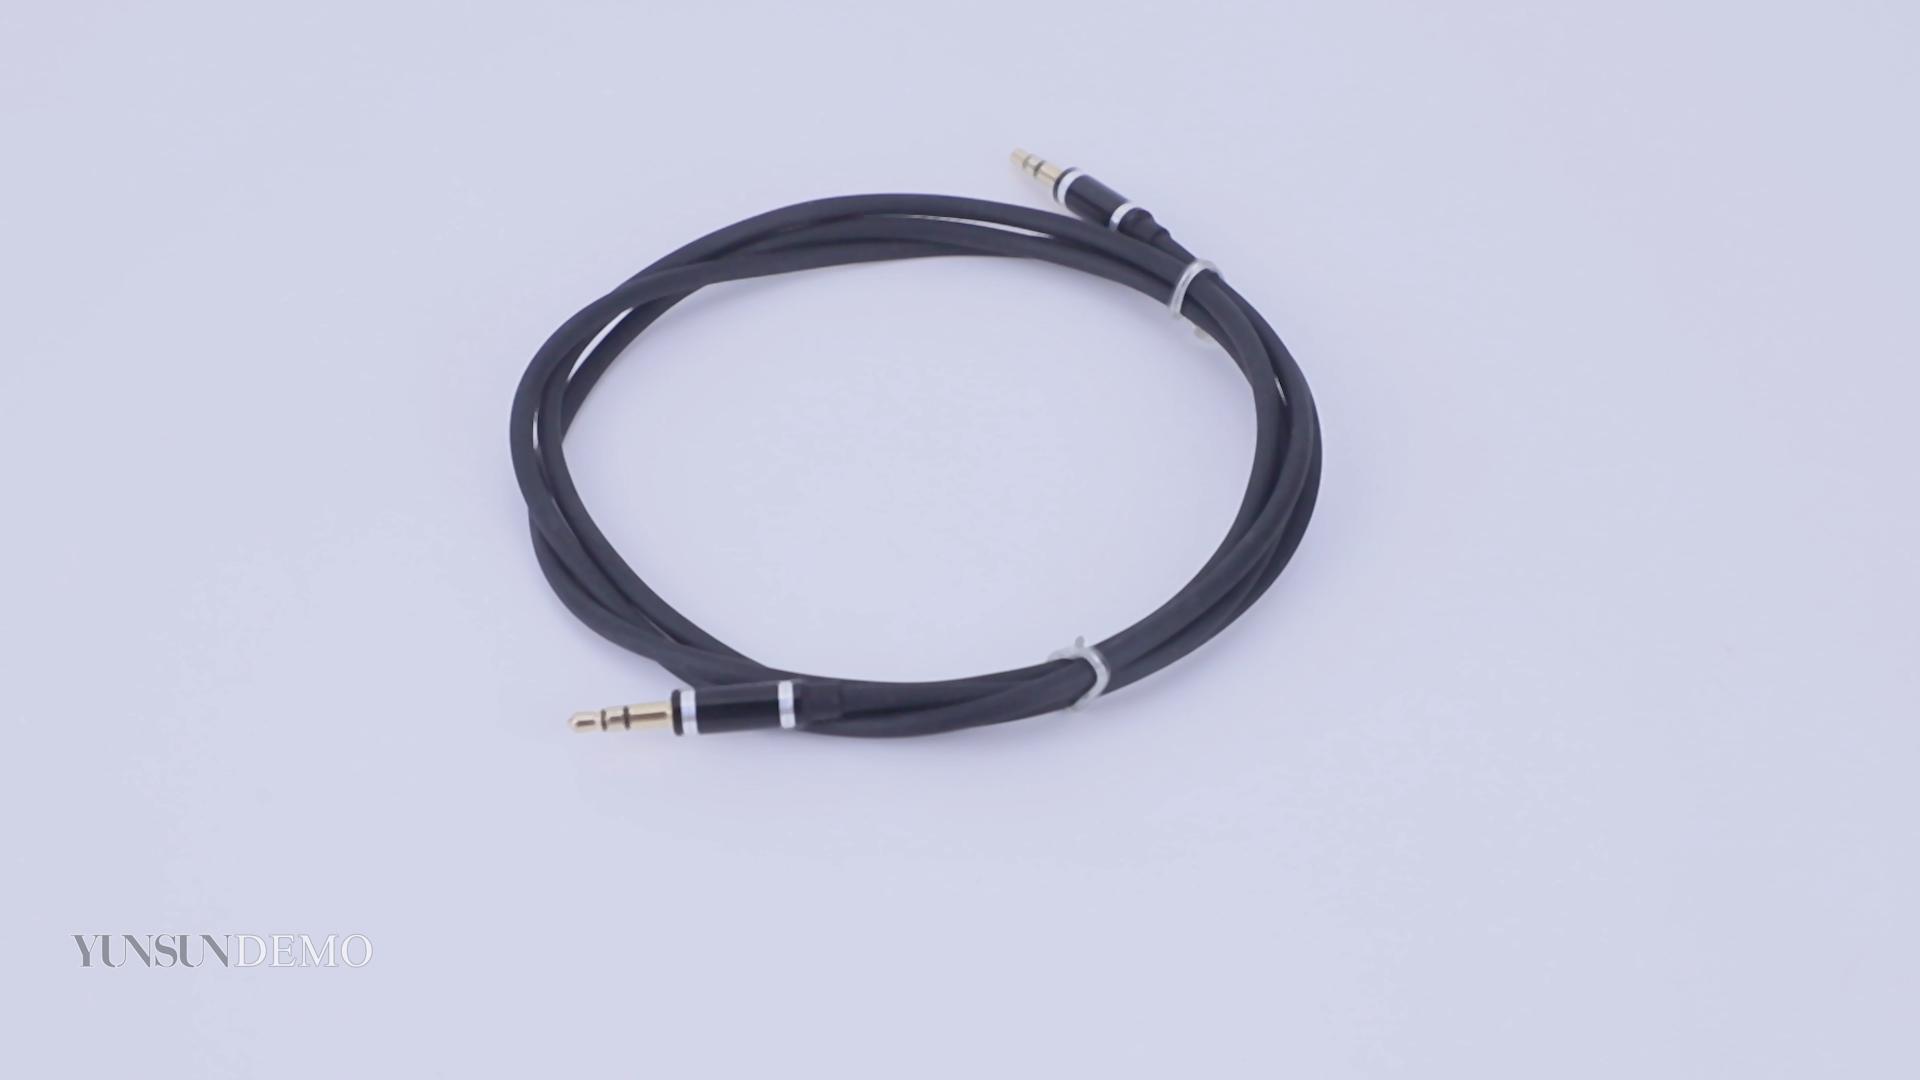 Cantell הנמכר ביותר 1m 2m 3m זכר לזכר Aux כבל אוזניות auxiliar כבל 3.5mm aux אודיו כבל